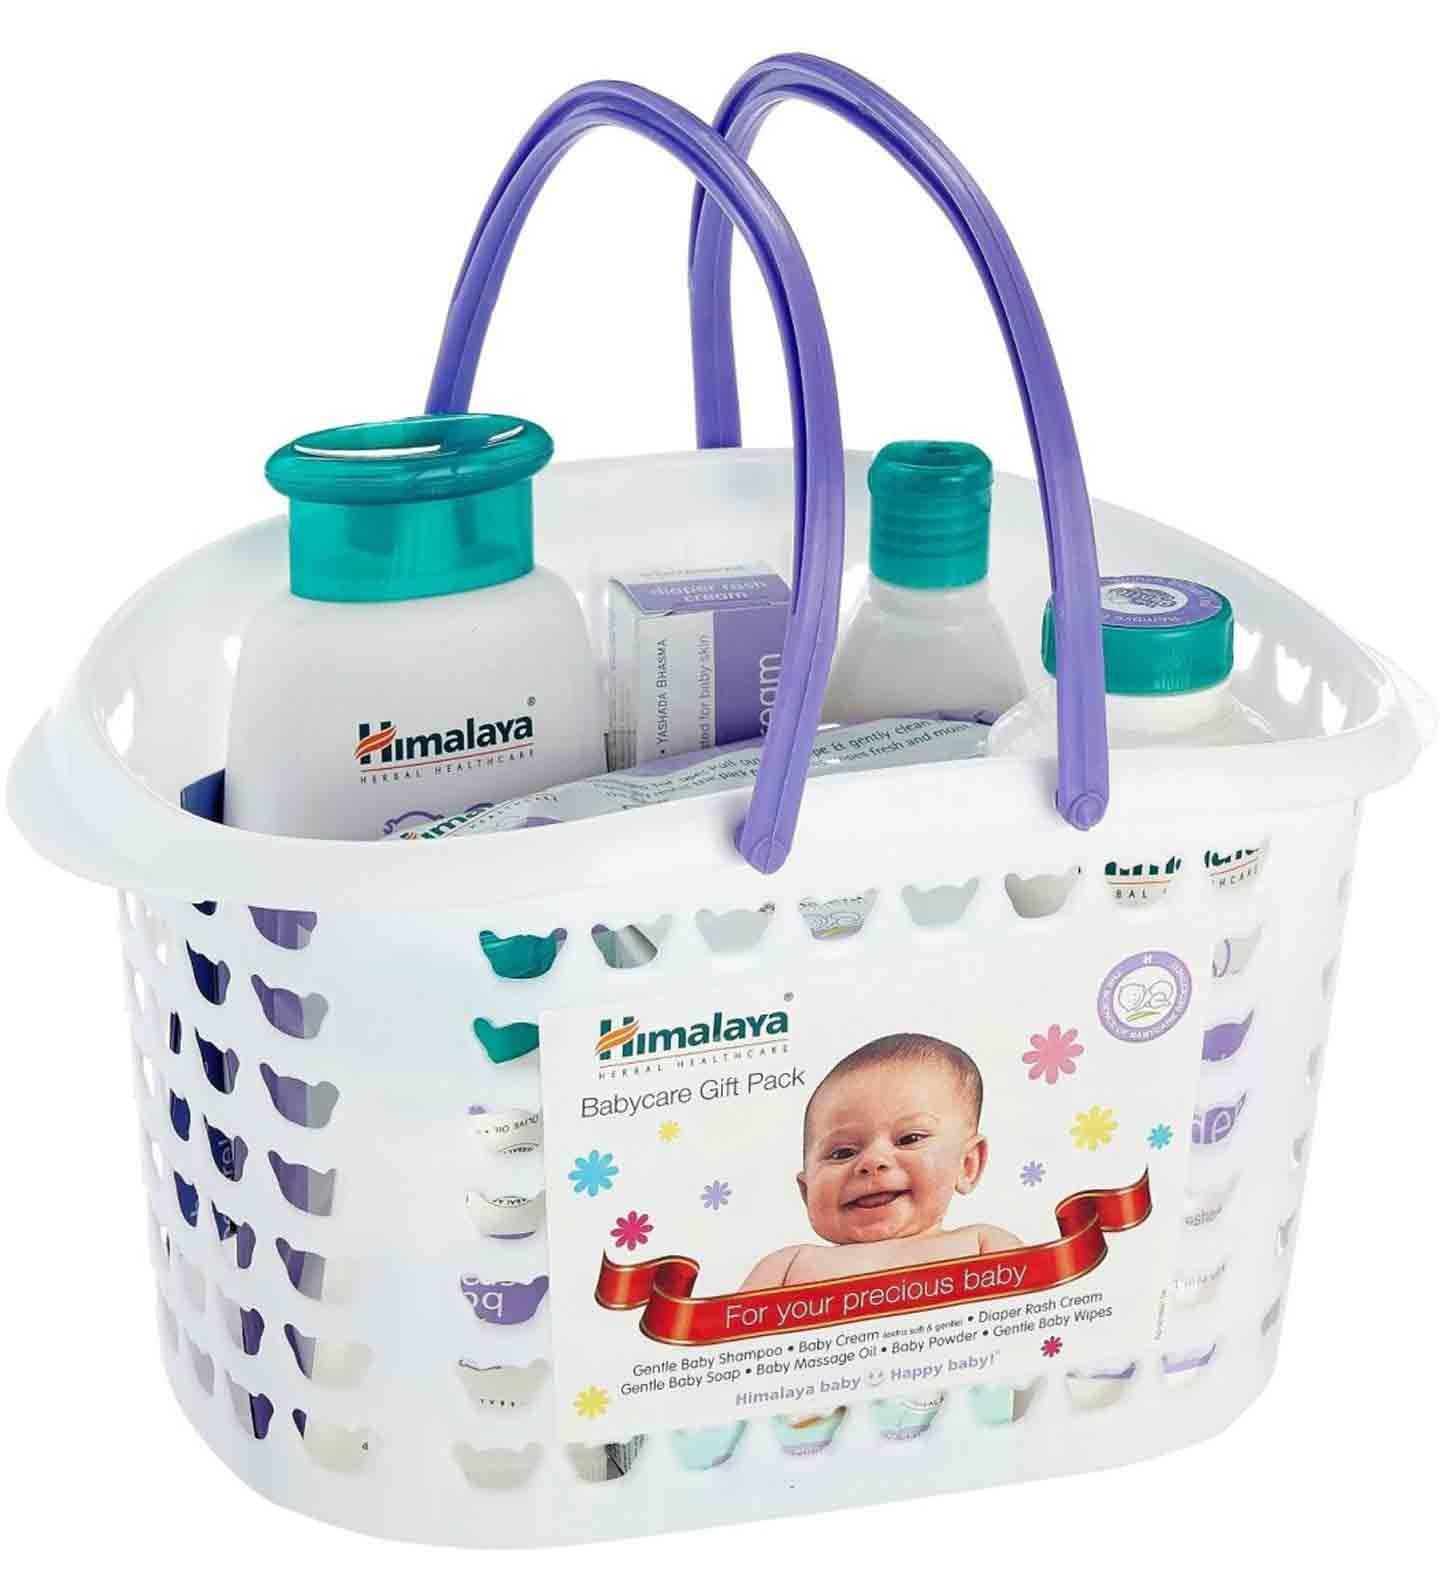 Himalayas Babycare Gift Basket Contents Baby Cream 50 Ml Sebamed Diaper Rash 100ml Massage Oil 100